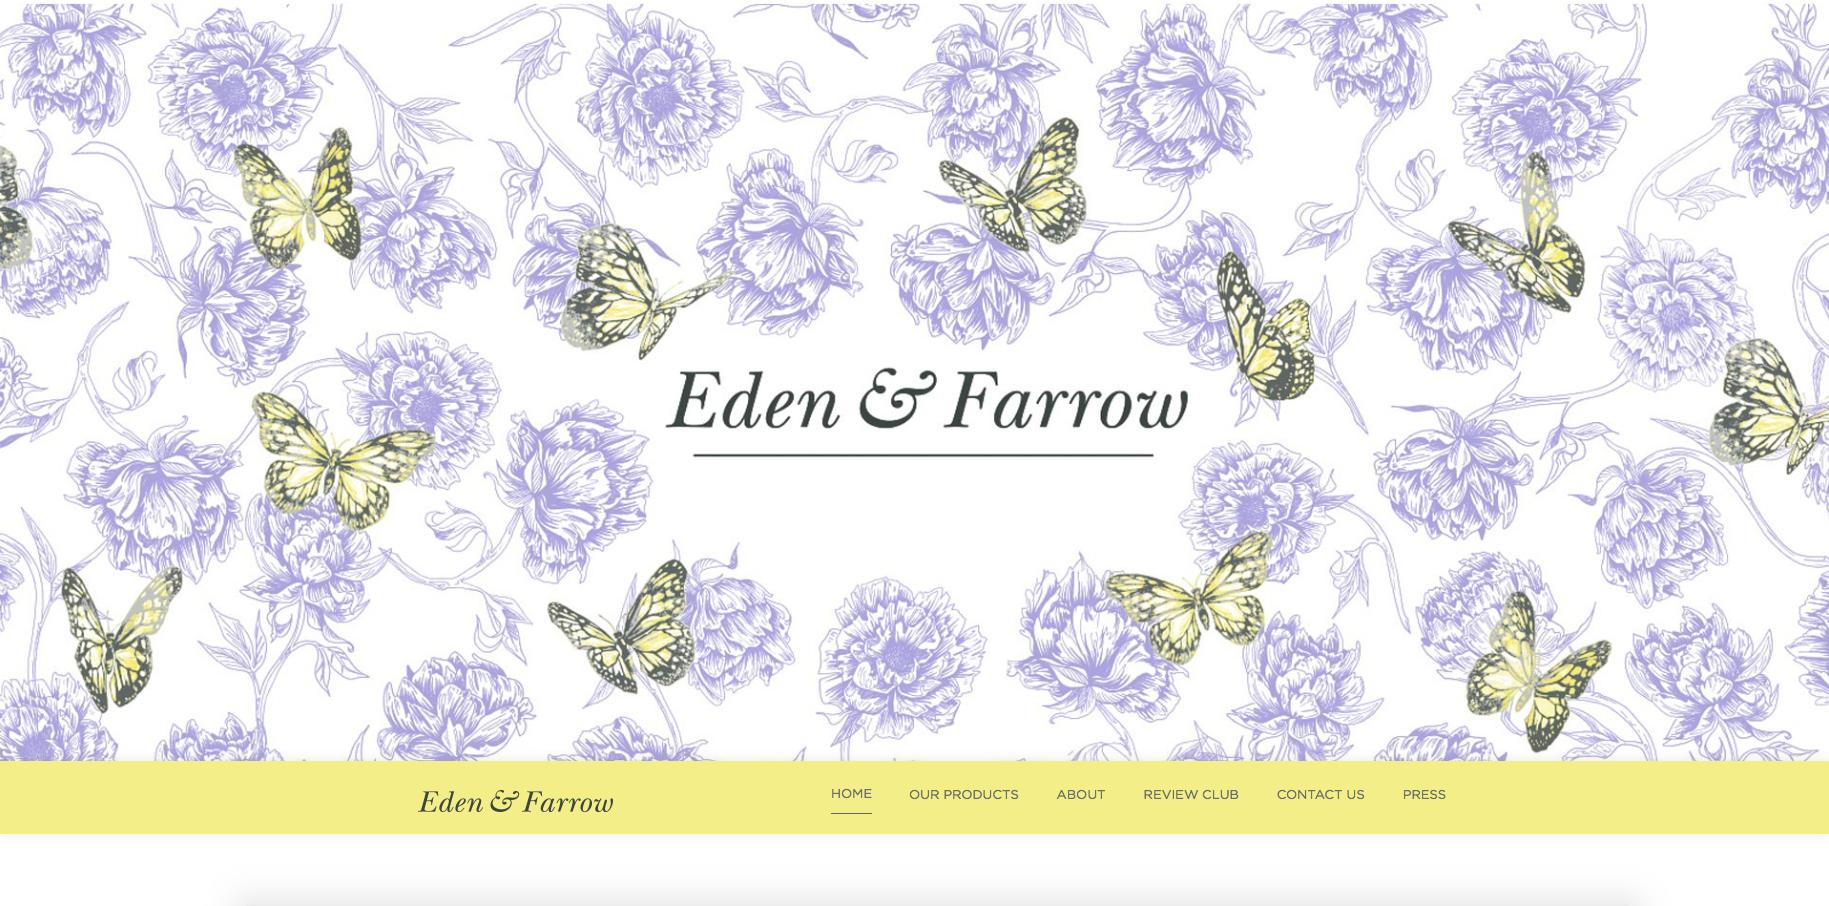 Eden & Farrow Cosmetic Range